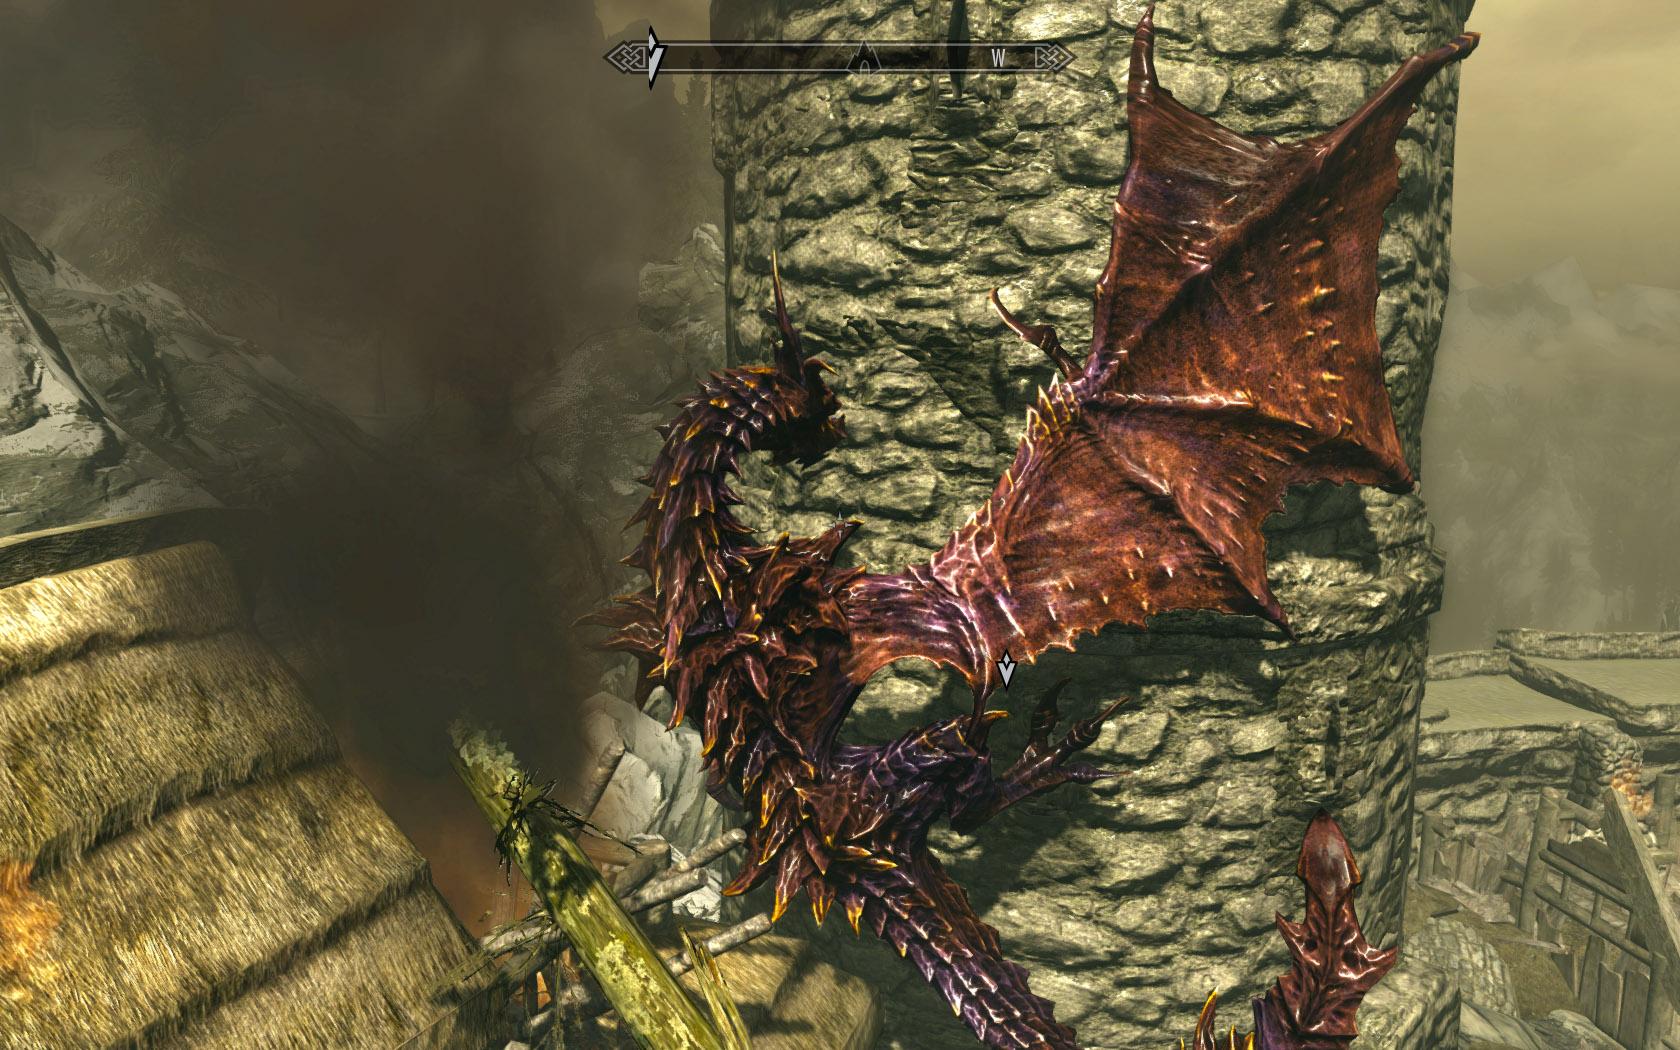 Skyrim Dragon Mod